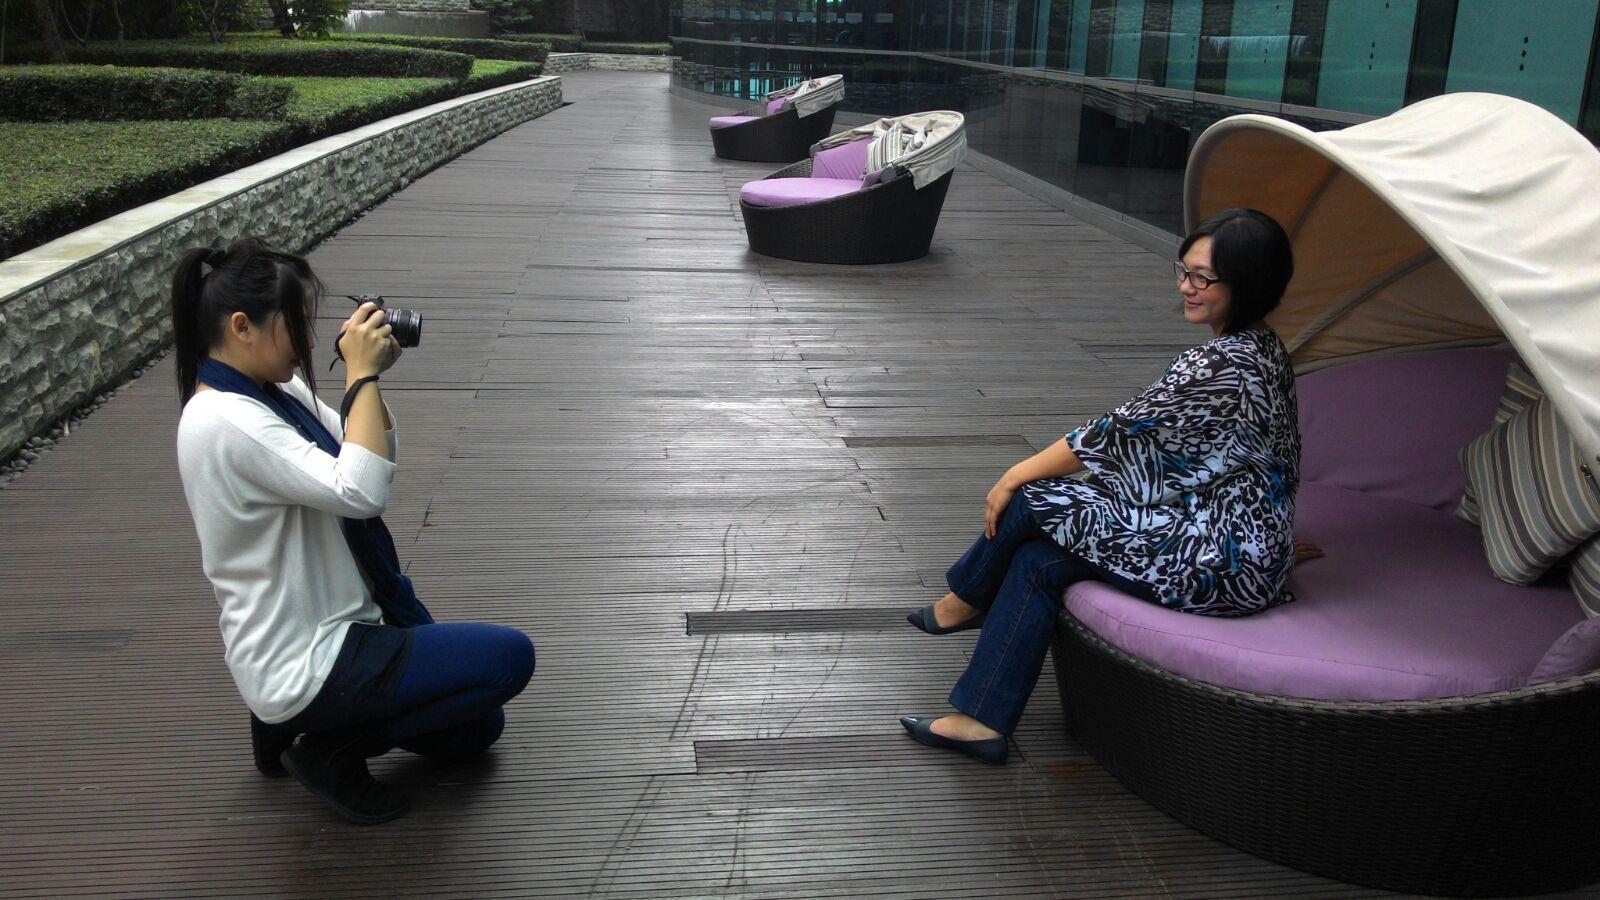 Behind the scene with Aelke Mariska  as photographer, at pool garden, Pullman Hotel Jakarta.